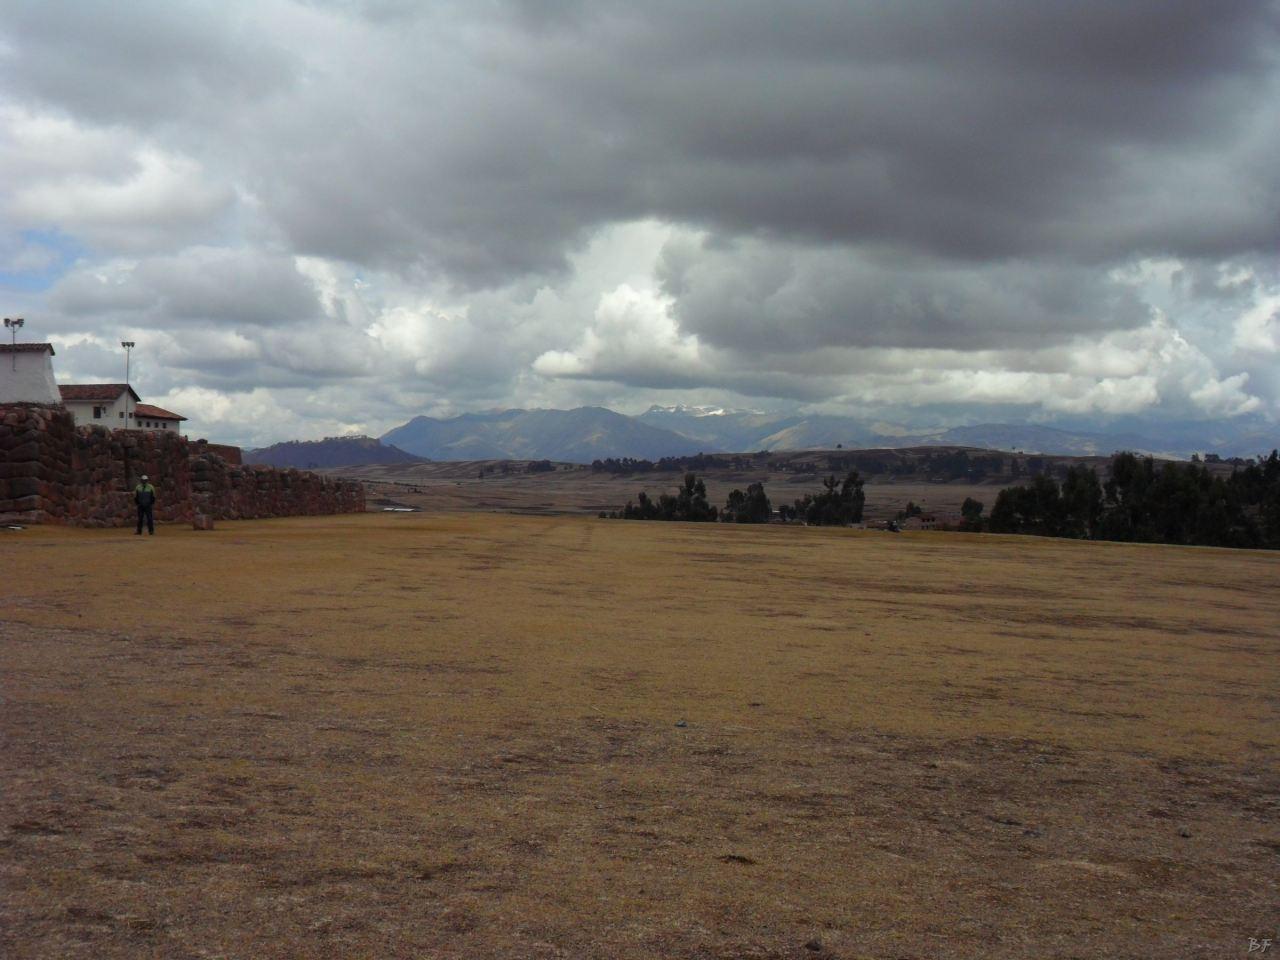 Chinchero-Mura-Poligonali-Piramide-Urubamba-Peru-36